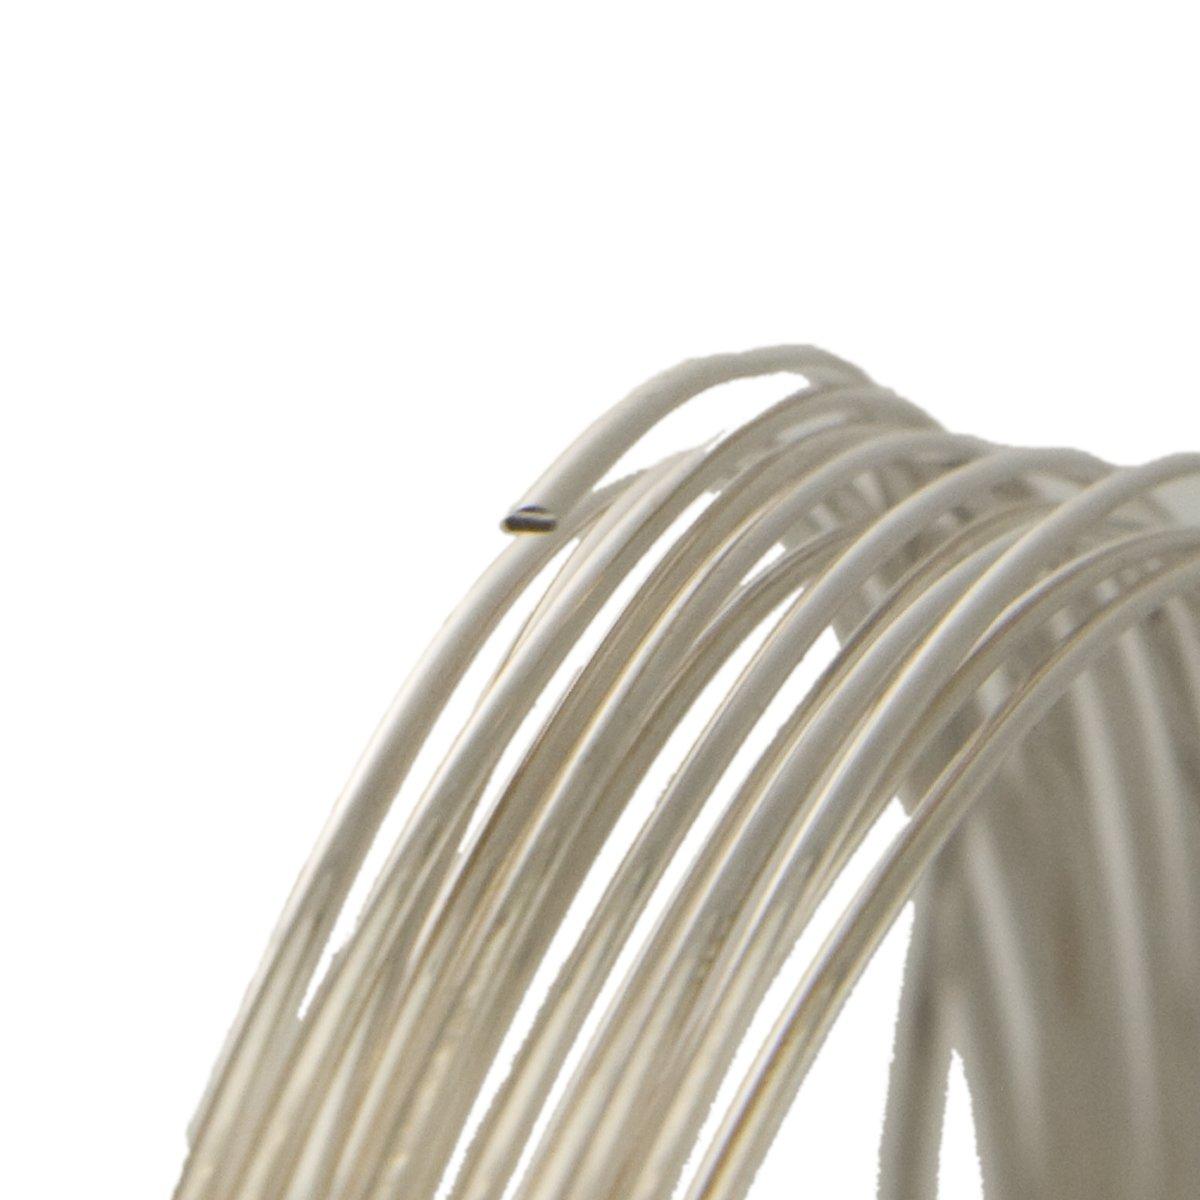 Amazon.com: 10 Gauge Half Round Dead Soft .925 Sterling Silver Wire ...